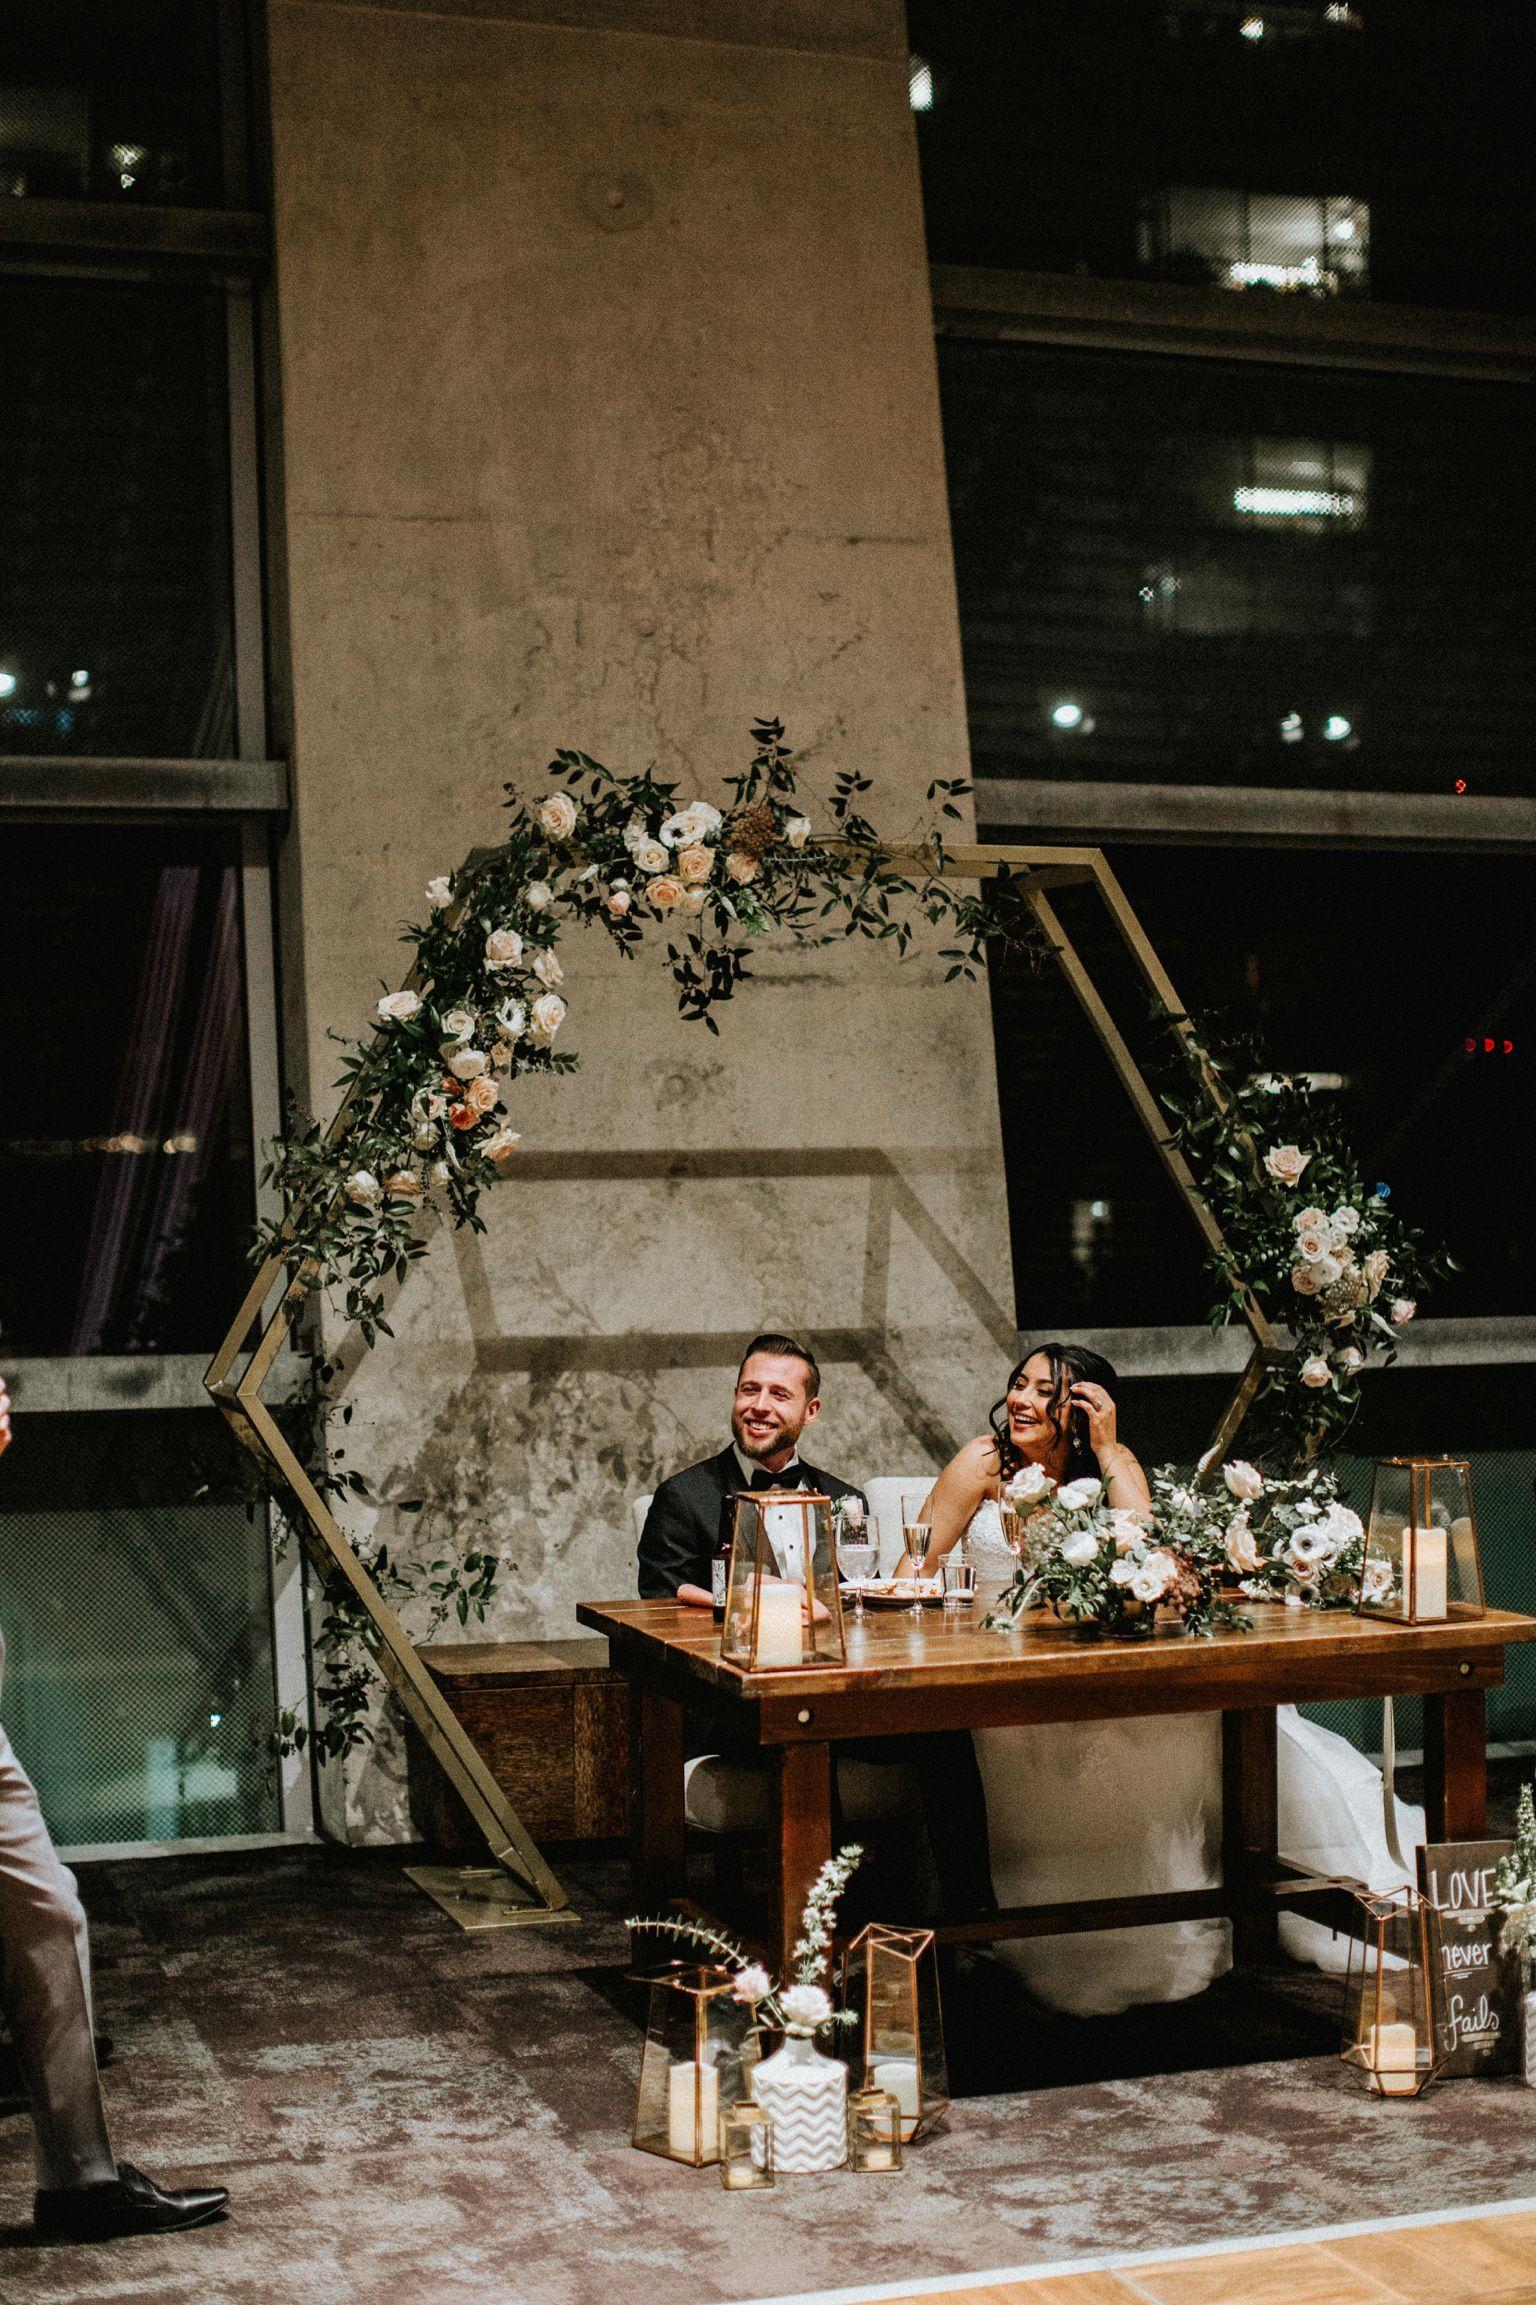 Hexagon Arch Venue San Diego Central Library Rentals Stecklair Events Hexagon Wedding Sweetheart Table Wedding Wedding Arch